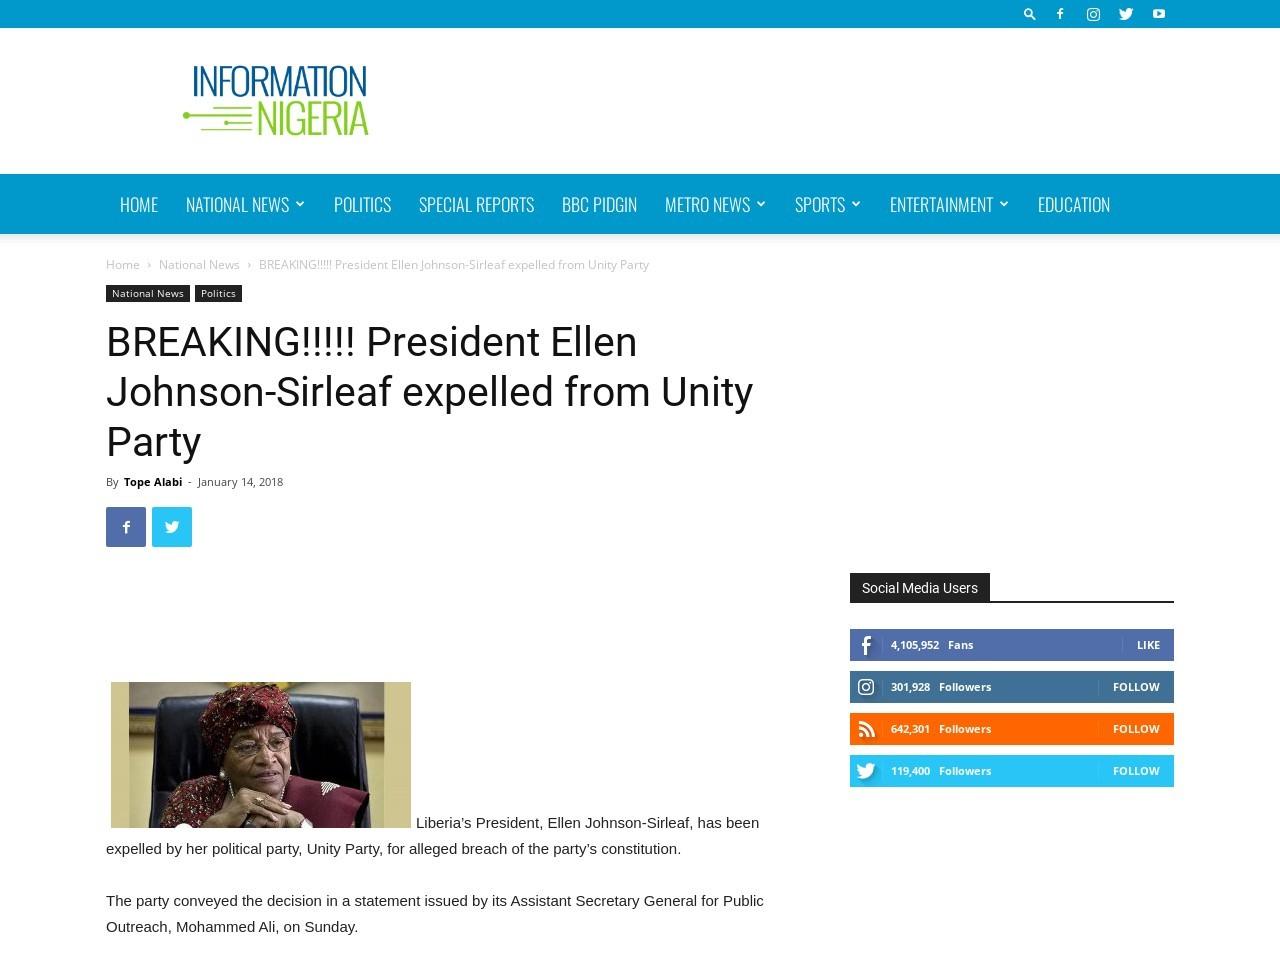 BREAKING!!!!! President Ellen Johnson-Sirleaf expelled from Unity Party